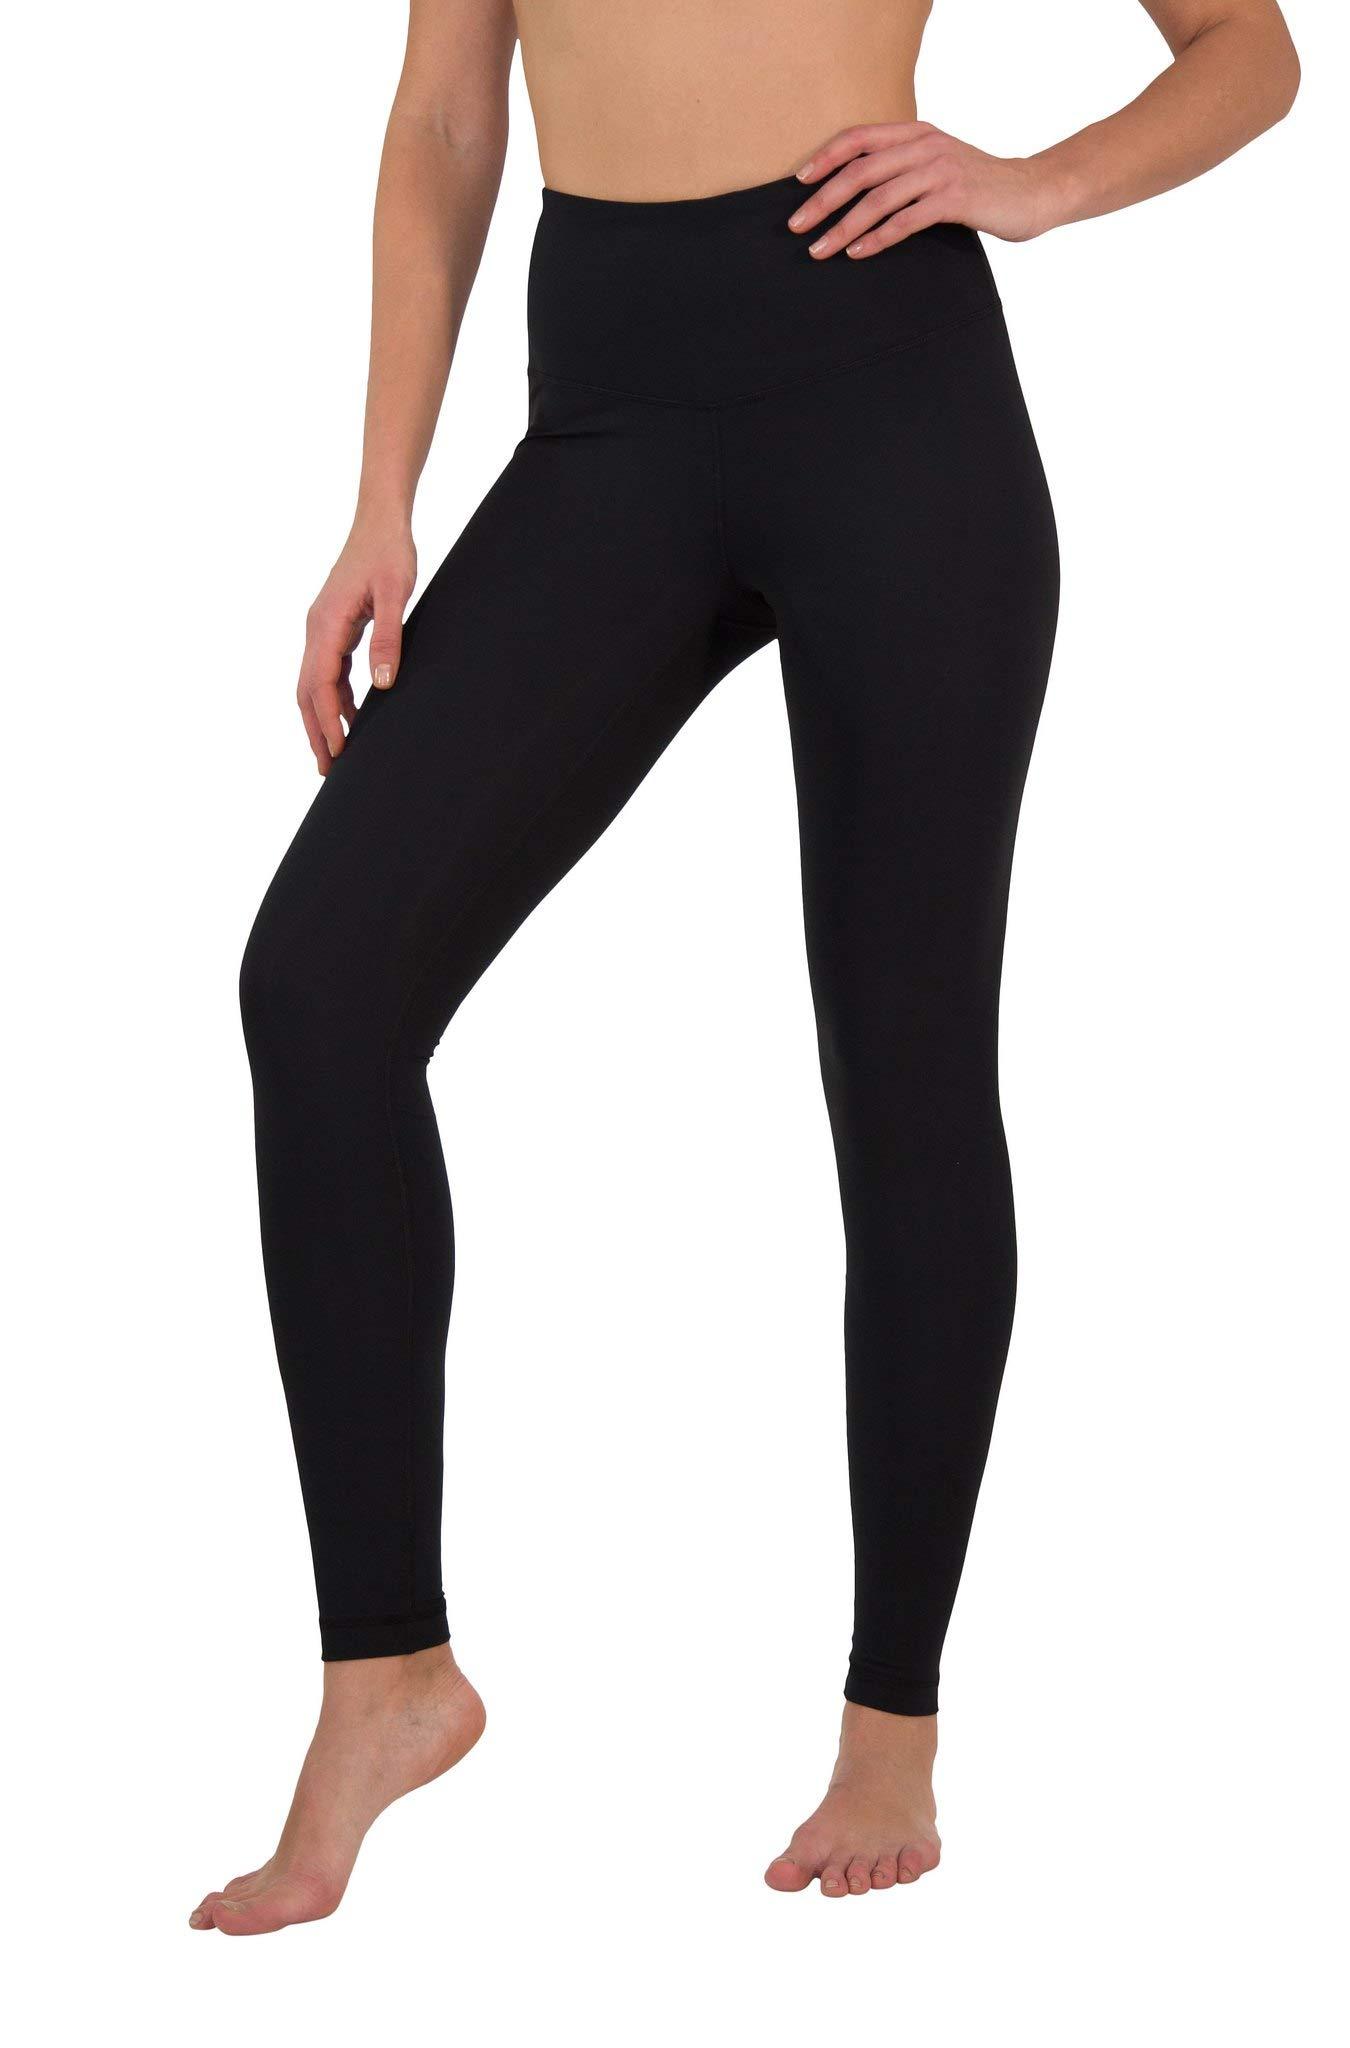 Yogalicious High Waist Ultra Soft Lightweight Leggings - High Rise Yoga Pants - Black - XS by Yogalicious